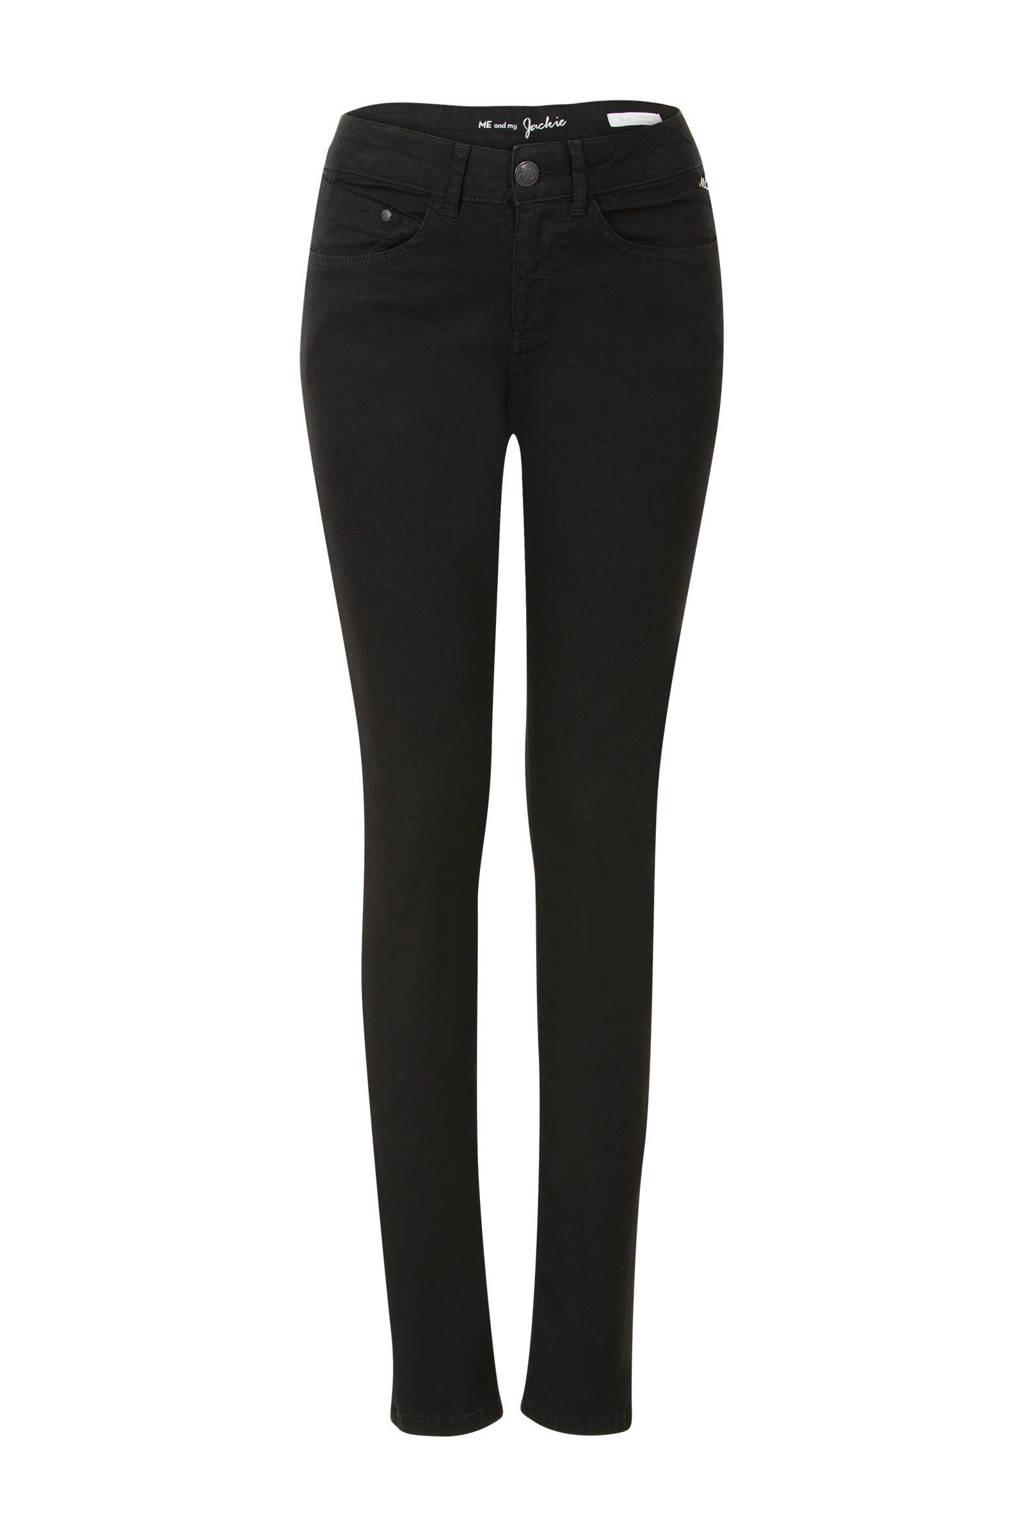 Miss Etam Regulier slim fit jeans Jackie 32 inch zwart, Zwart